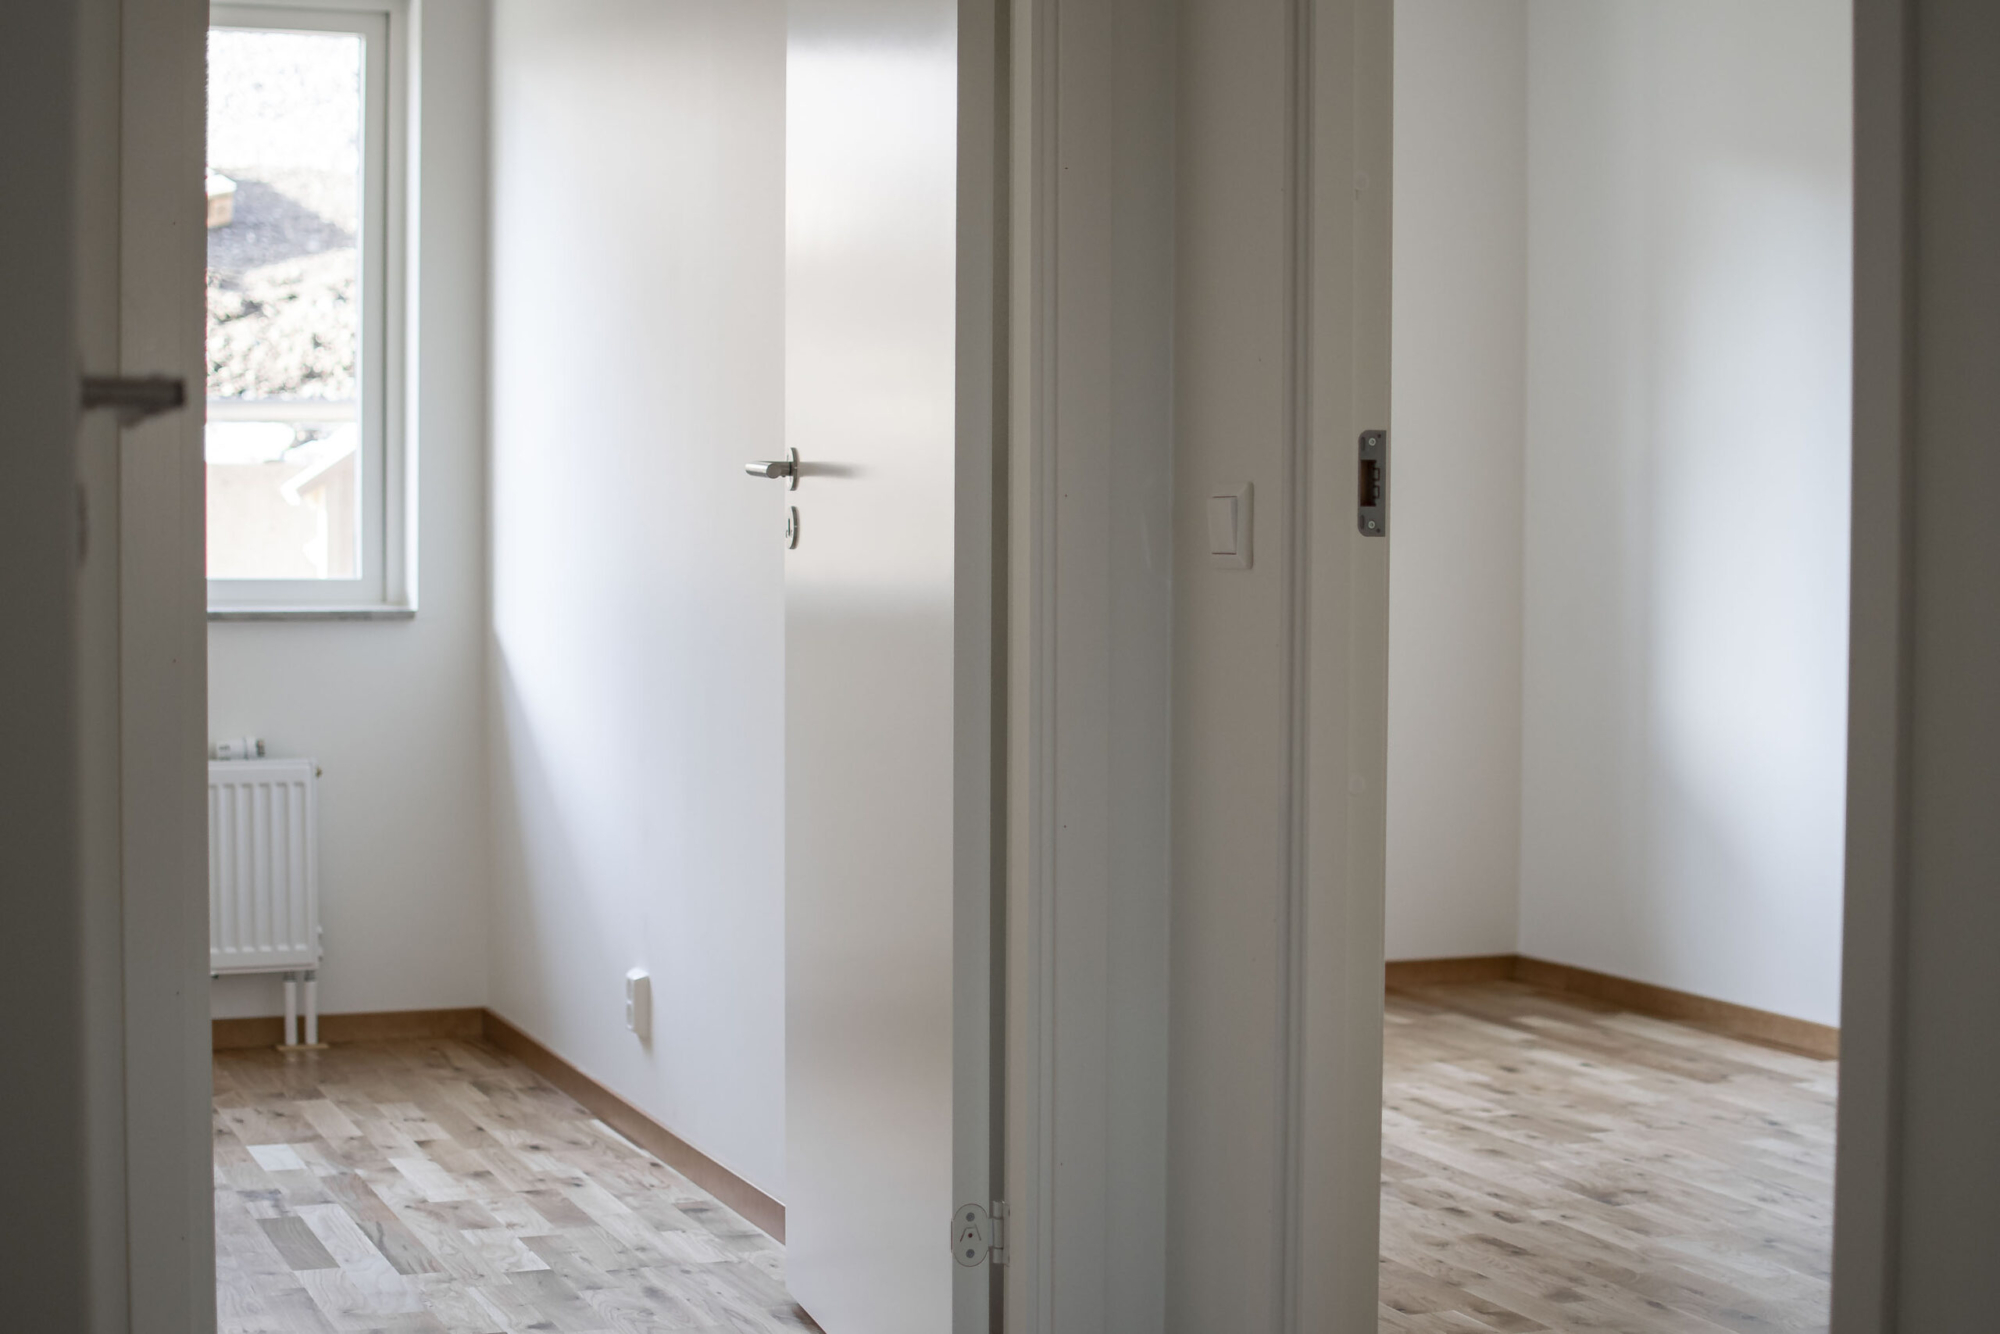 Nybyggda sovrum. Innerväggar i gips gjorda av GDSB Bygg.